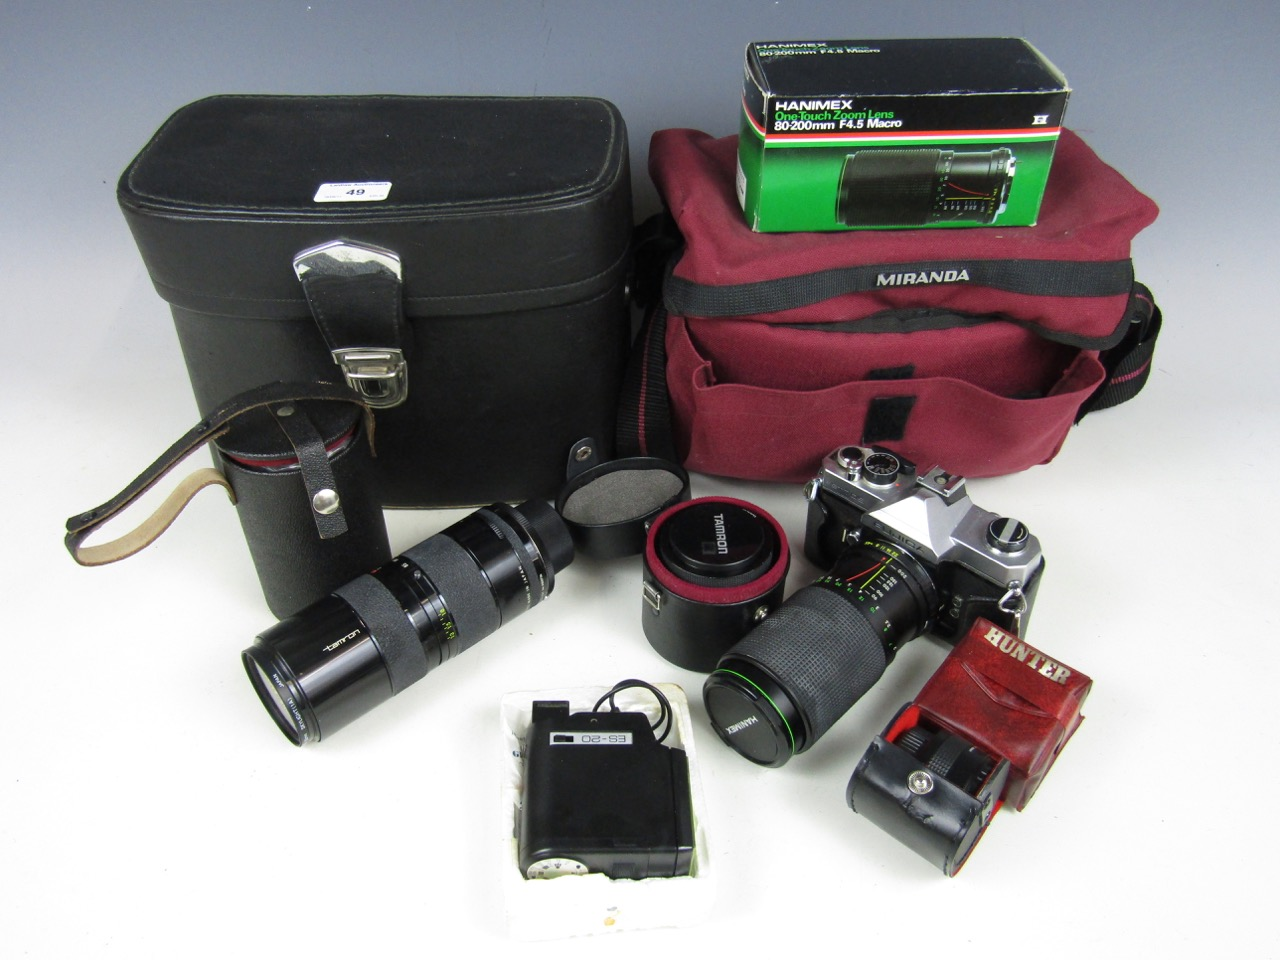 Lot 49 - A quantity of camera equipment including a Tameron camera lens, a Yashica ES20 flash, a Carl Zeiss